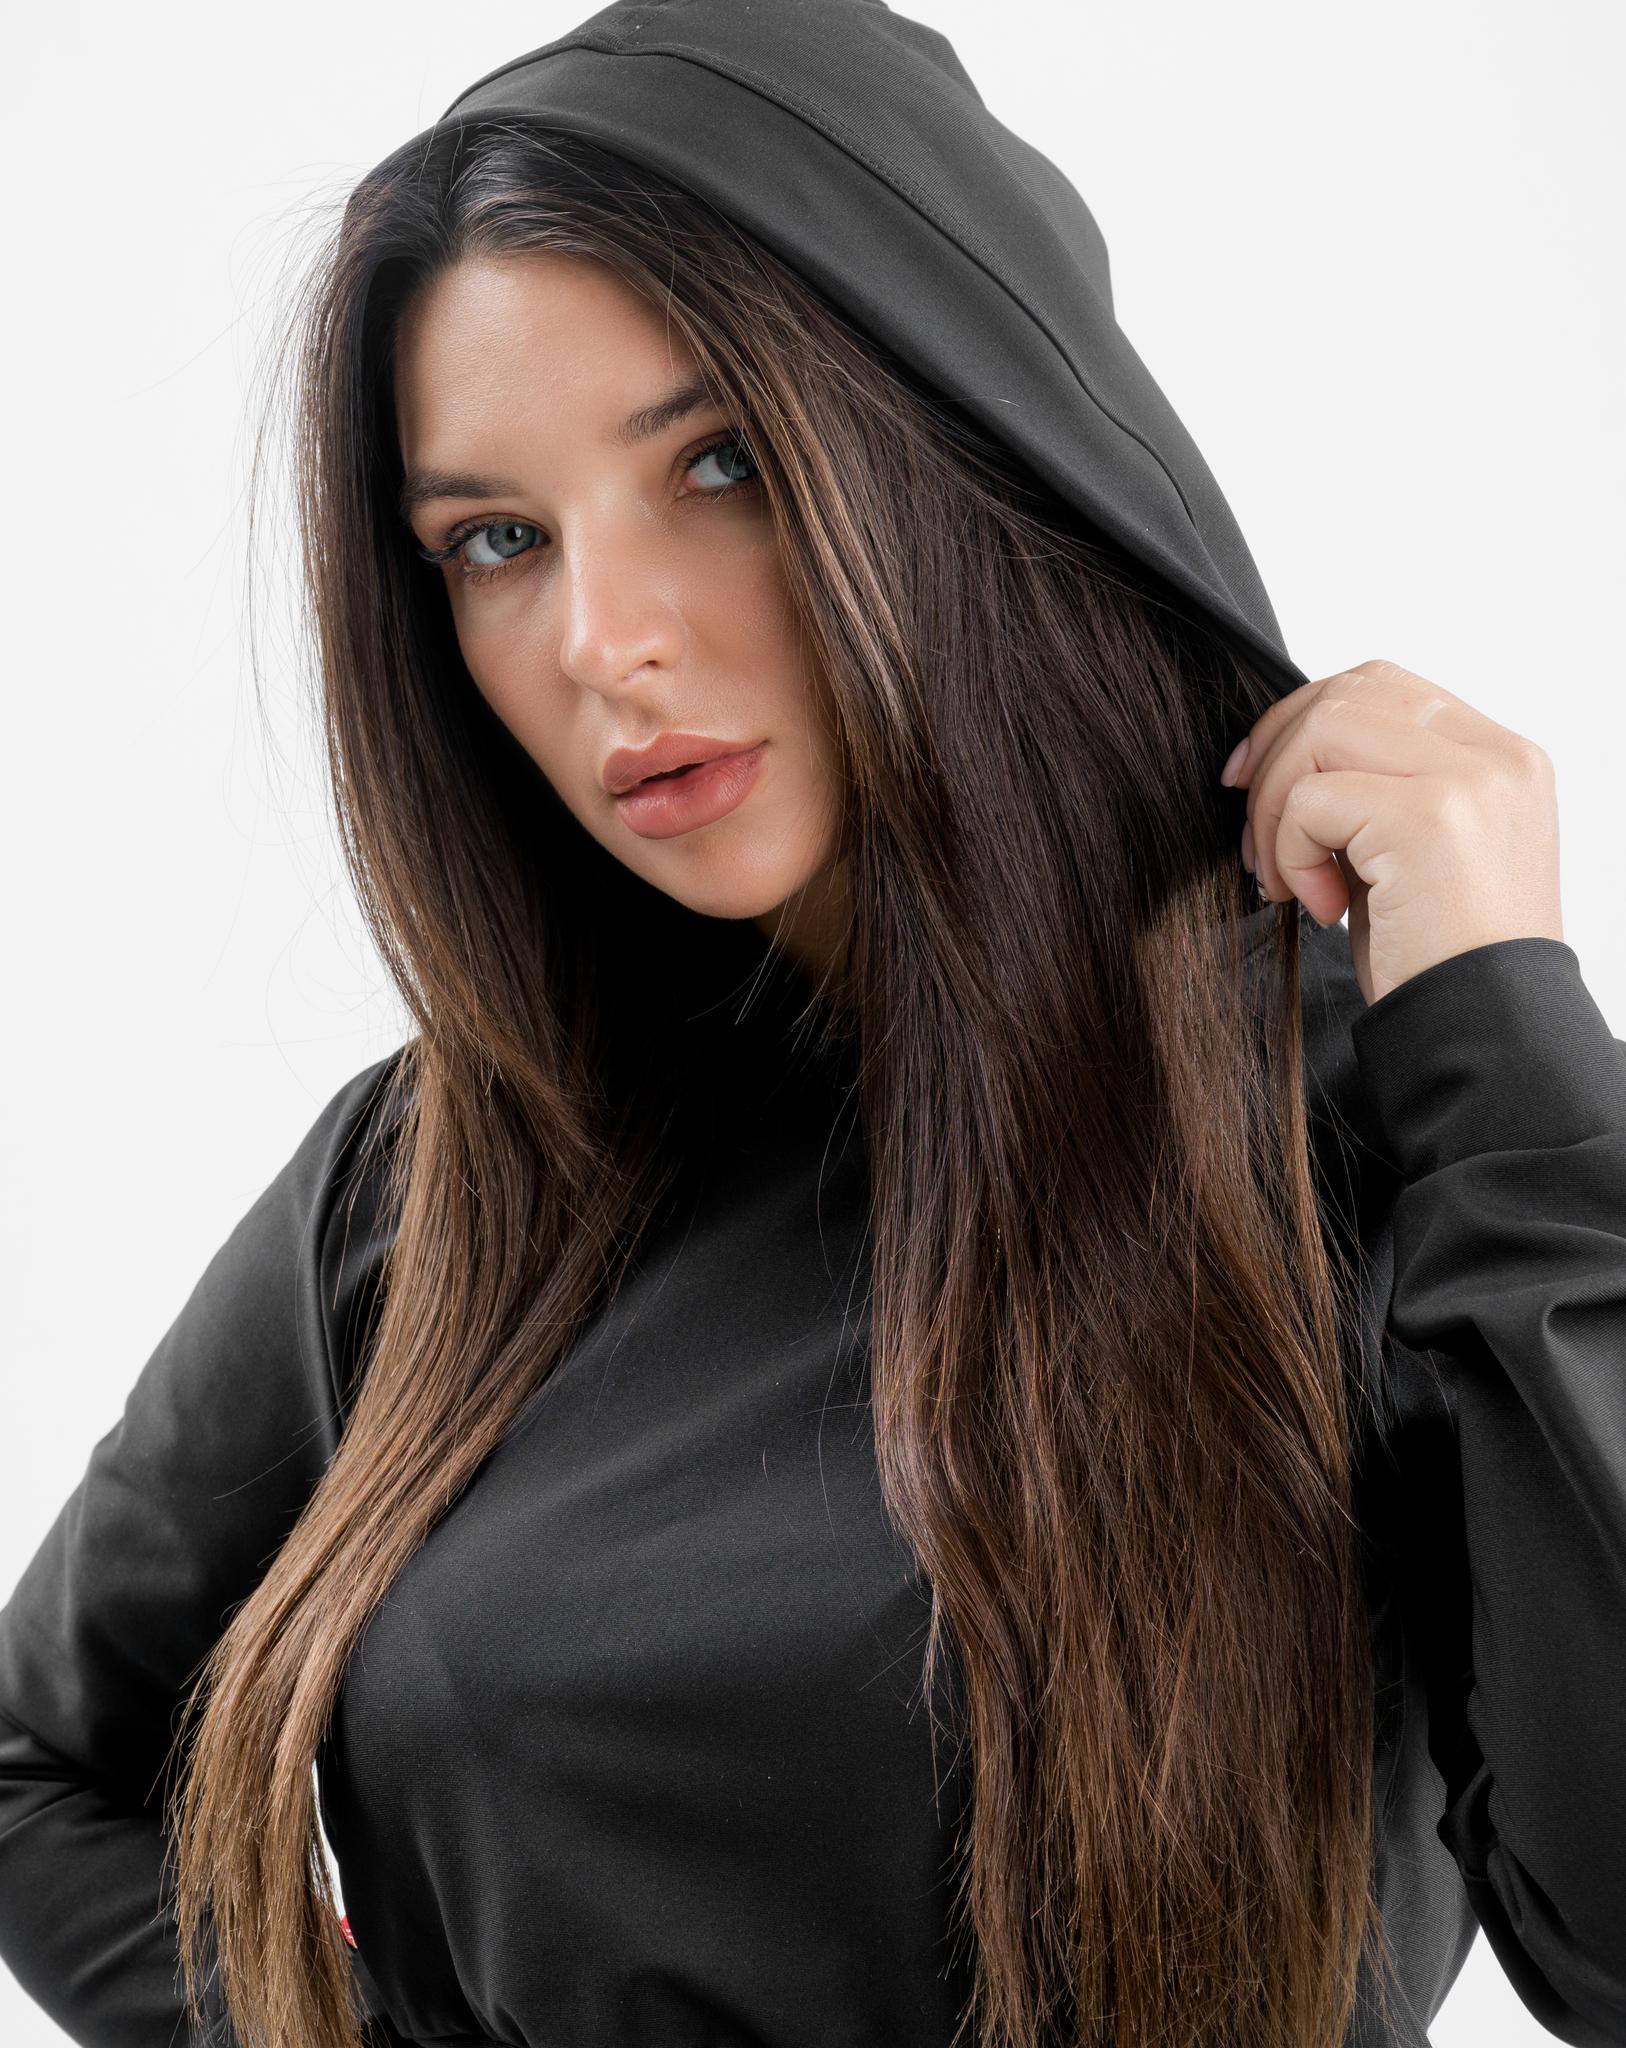 Женский топ с рукавами и капюшоном Infinity crop top with hoodie 117 black